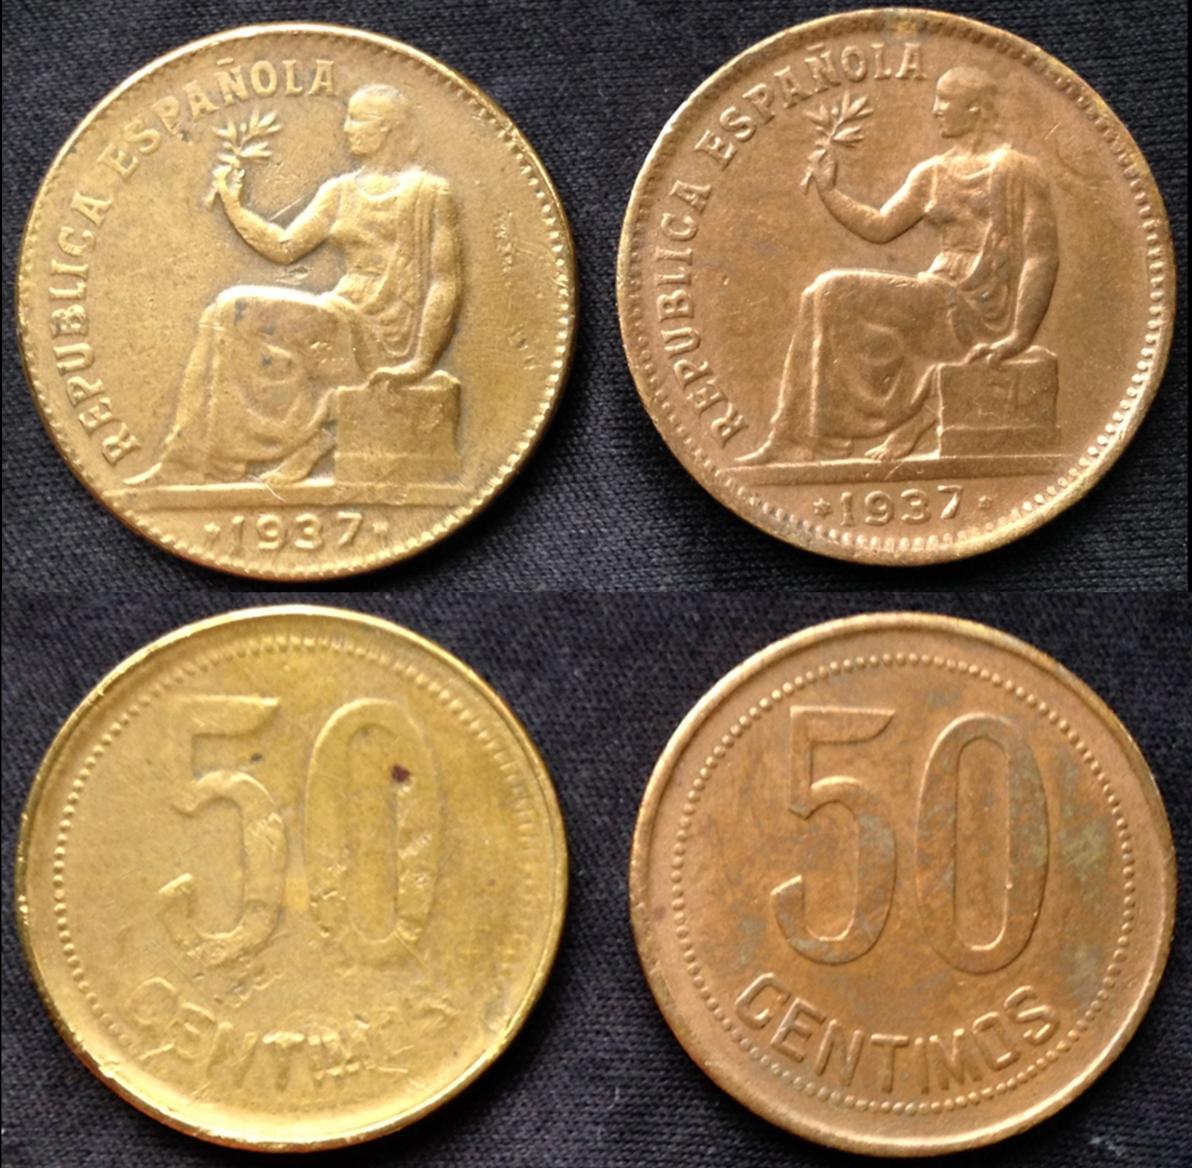 50 céntimos 1937- Variante Latón 50_c_ntimos_1937_lat_n_comparaci_n